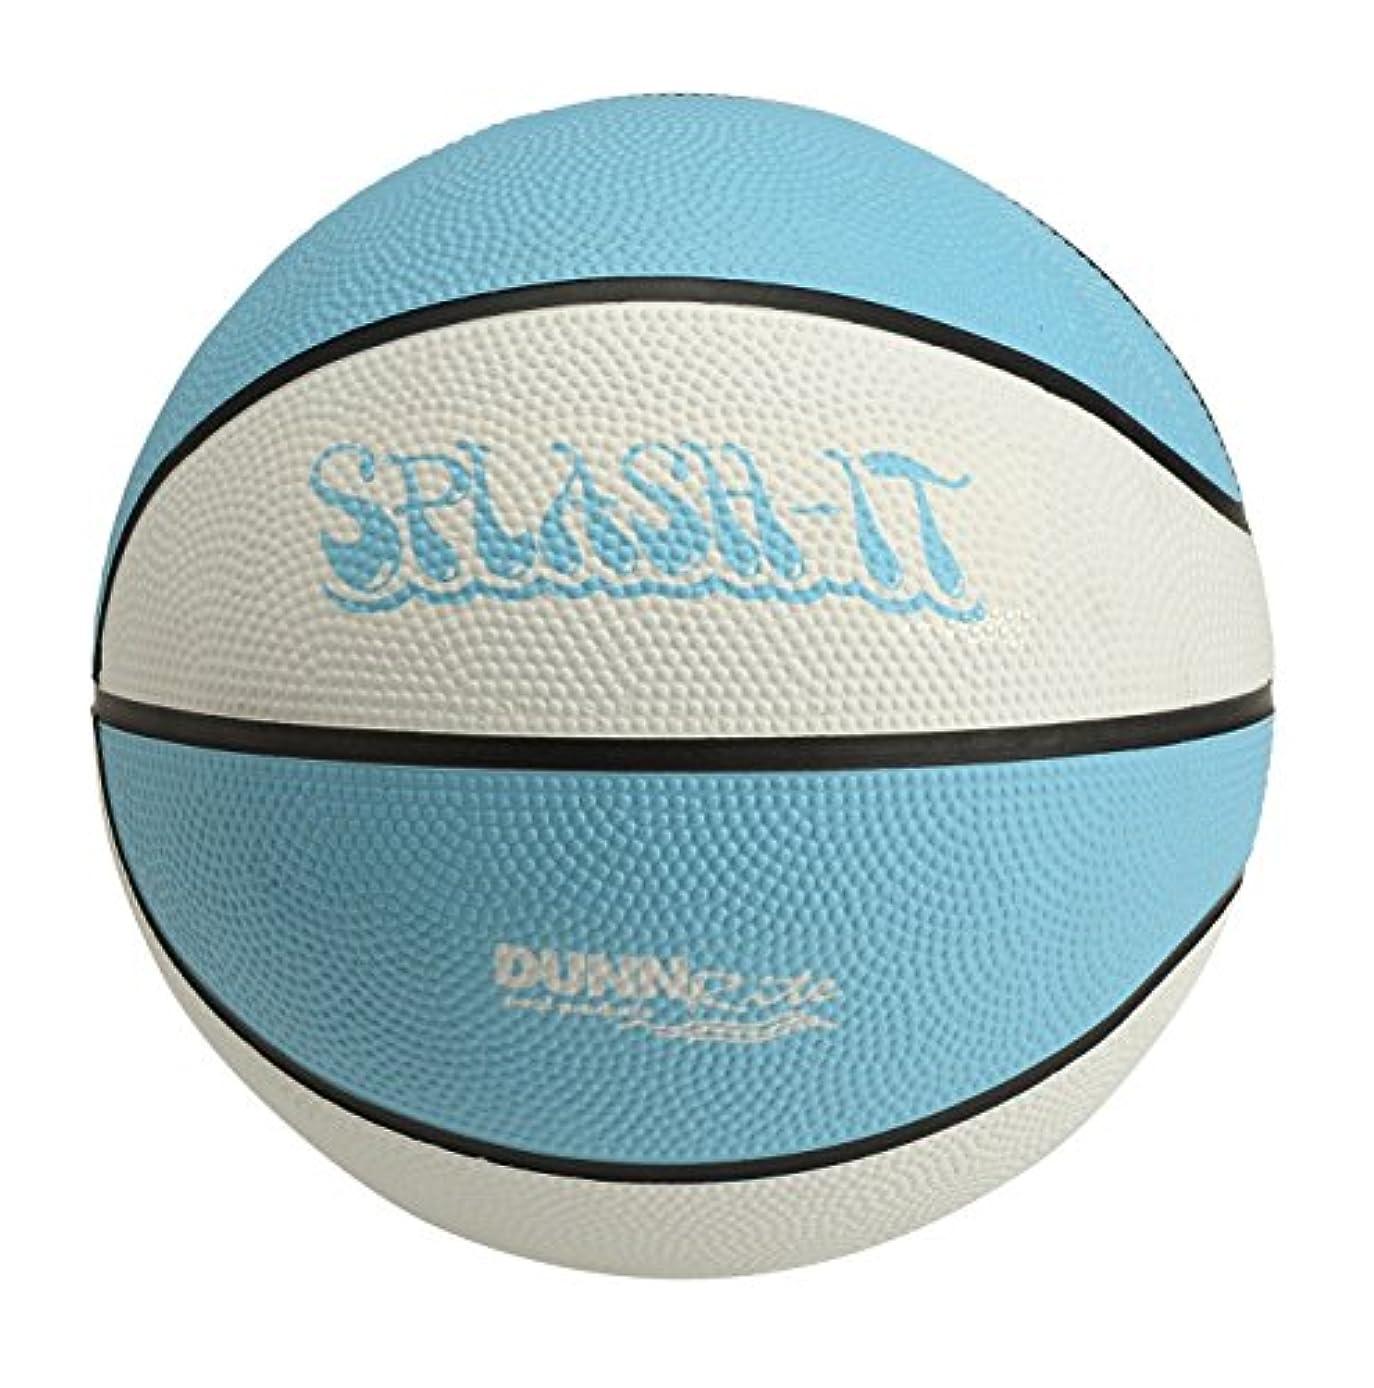 Dunnrite Pool/Water Basketball 8 inch